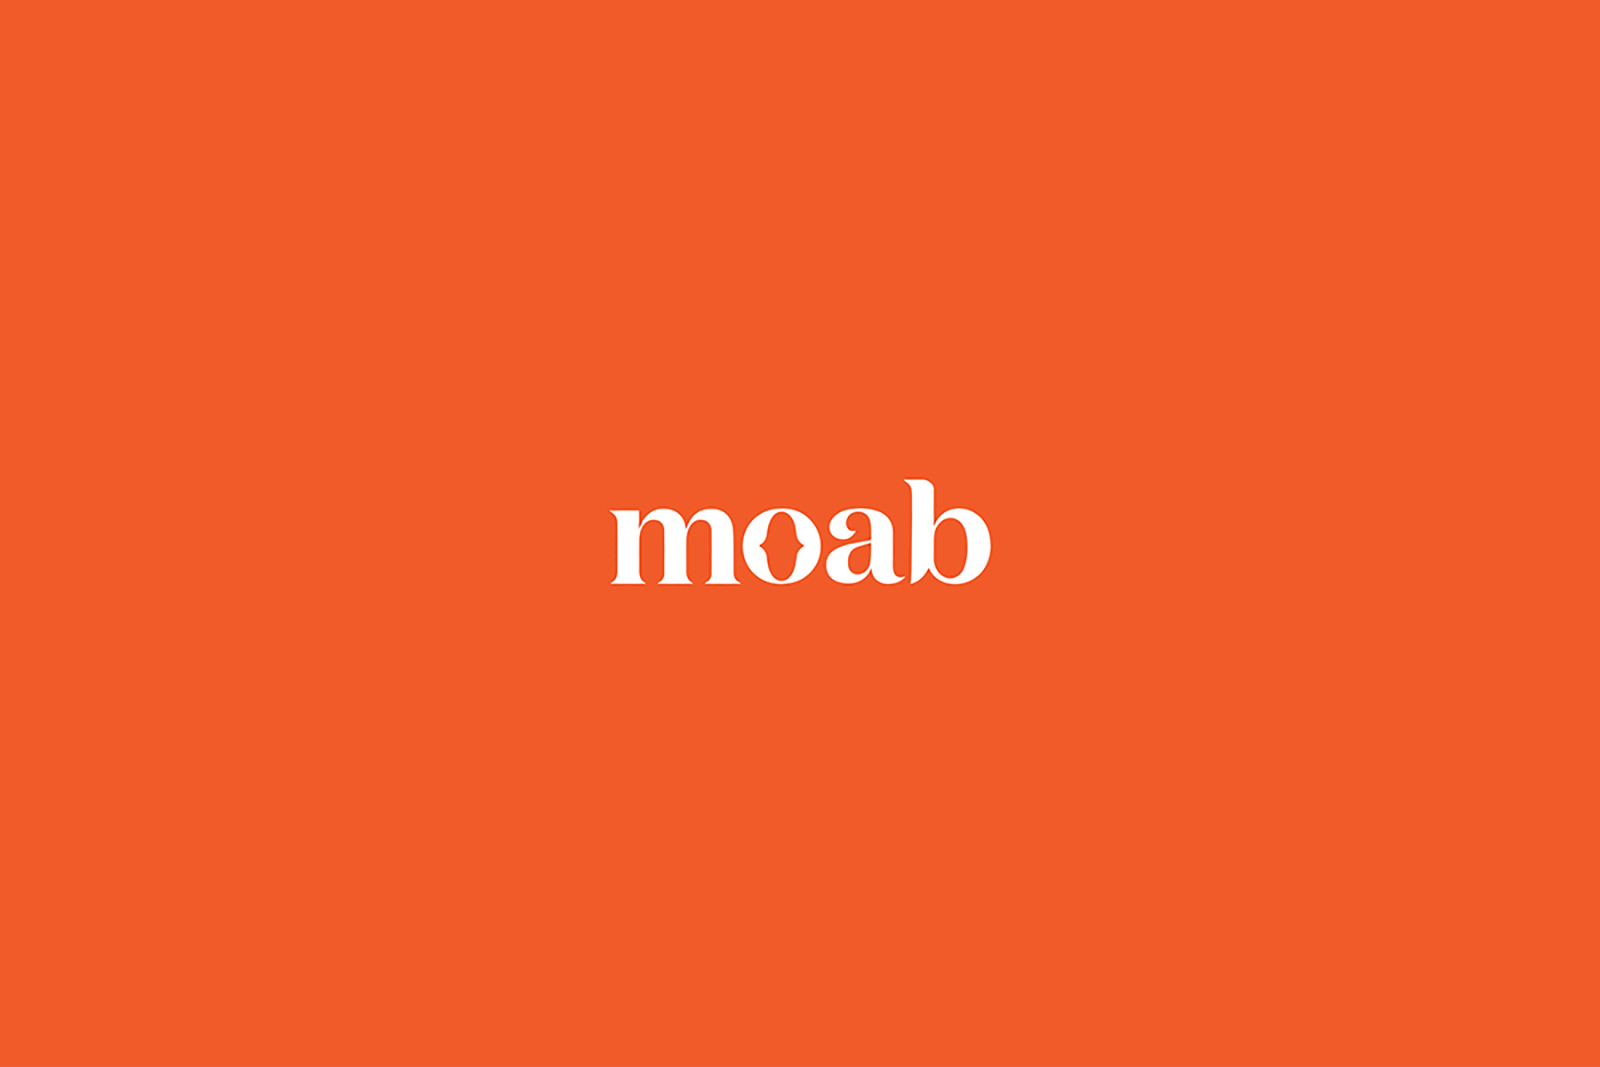 Moab纸张公司更新了全新的品牌形象-深圳VI设计2